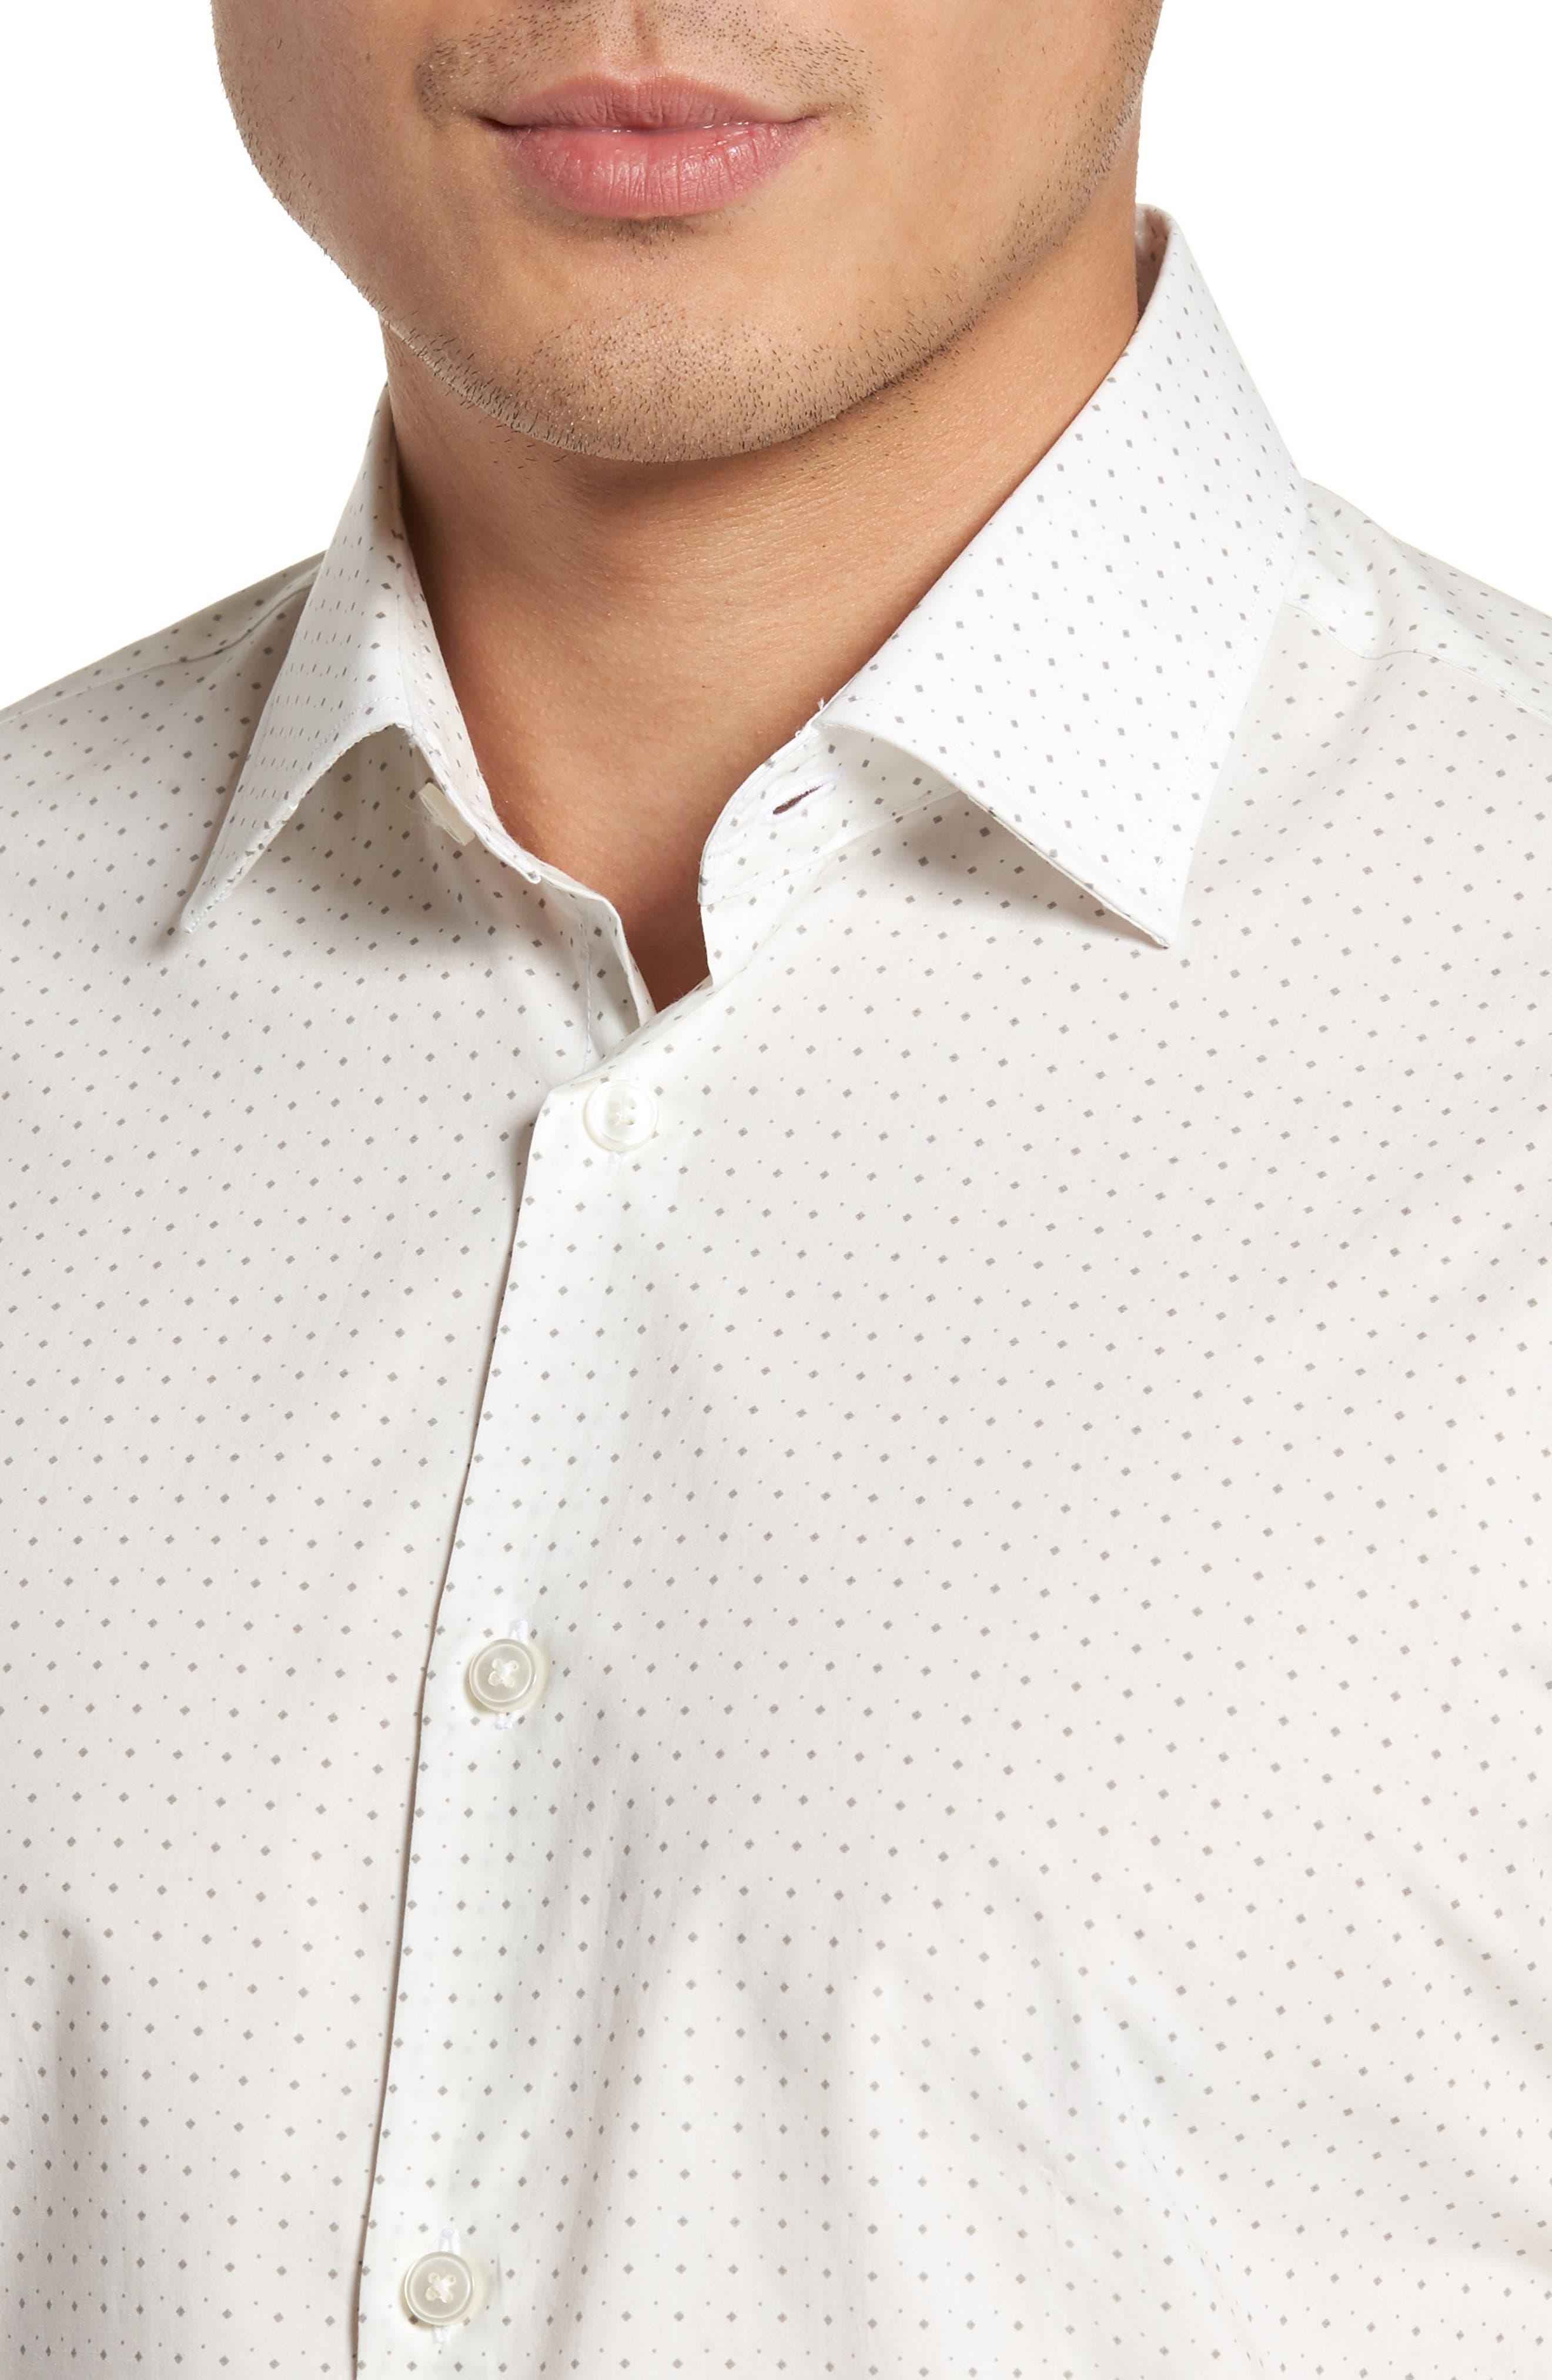 Regular Fit Diamond Dress Shirt,                             Alternate thumbnail 2, color,                             GRIFFIN GREY